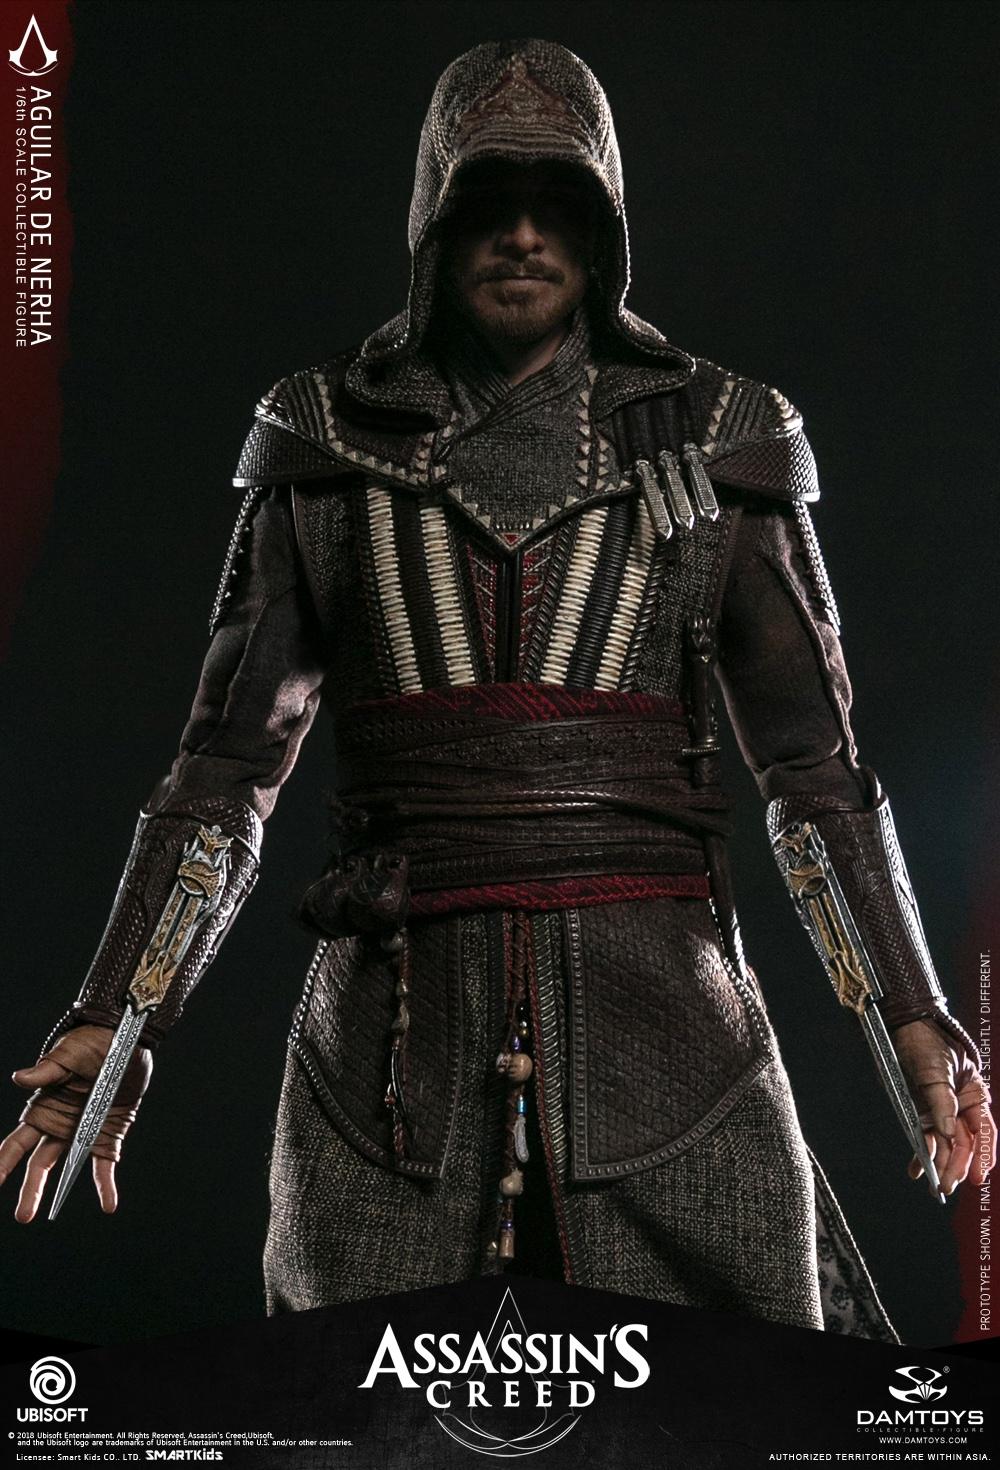 Damtoys DMS006 Assassin's Creed - Aguilar